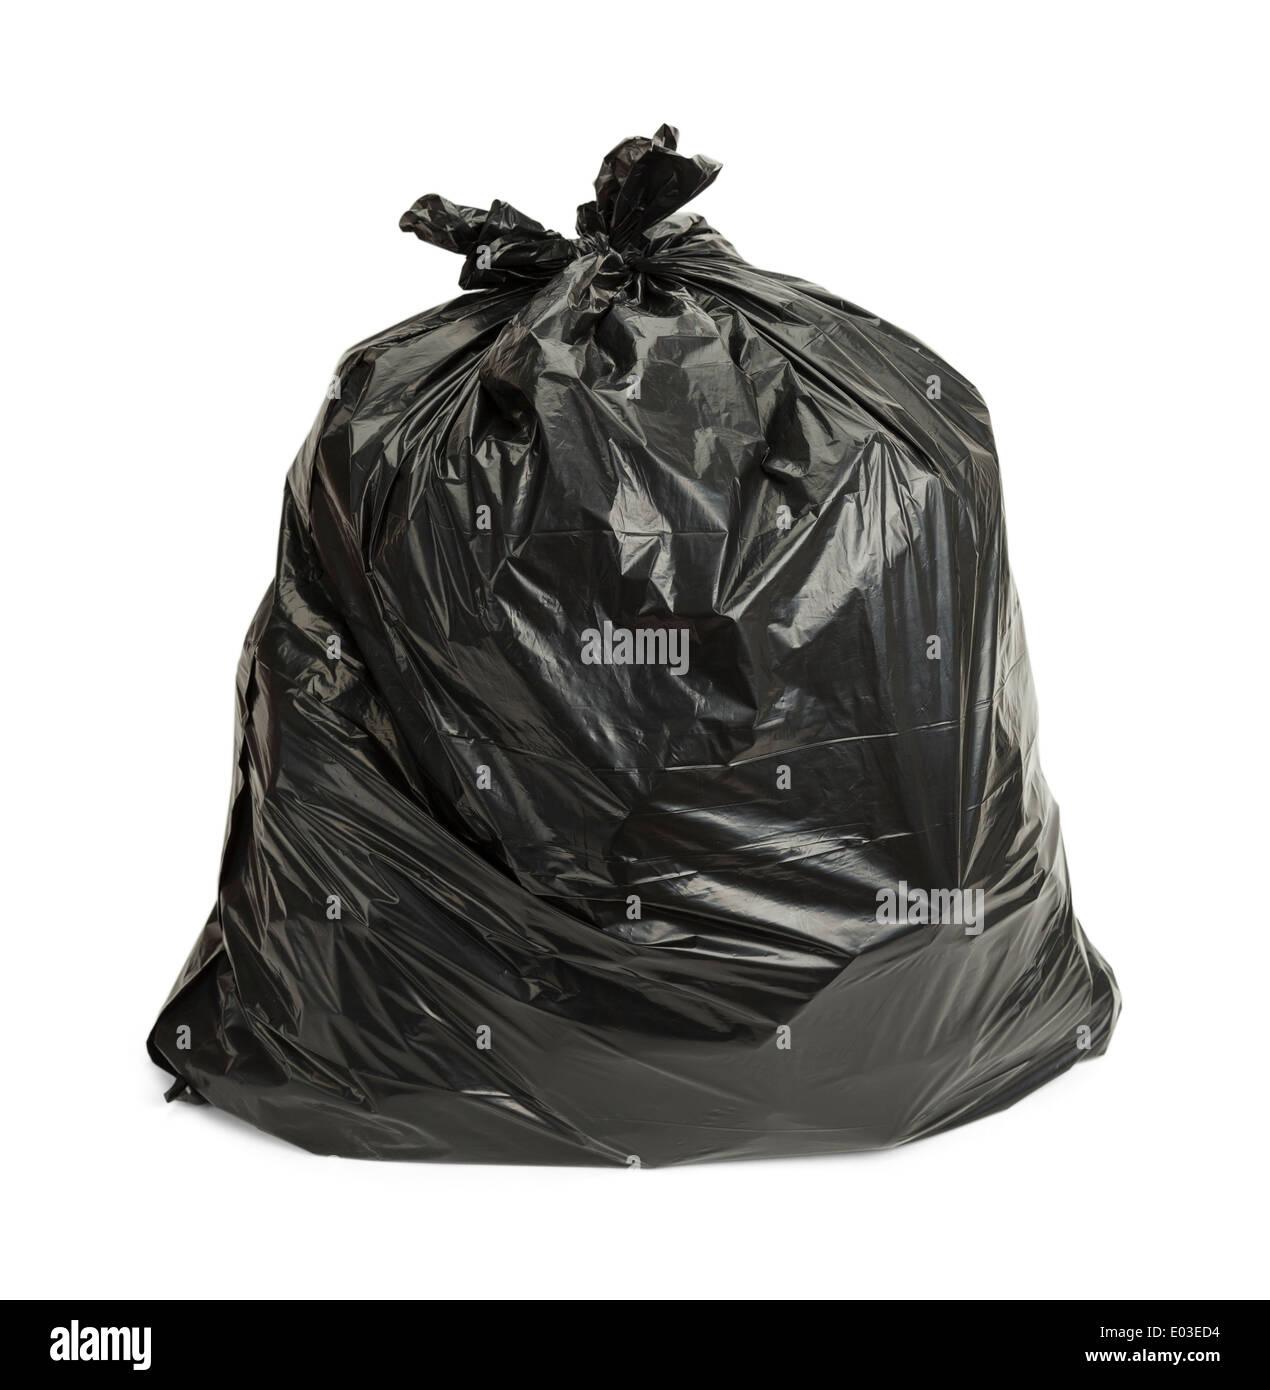 Full Garbage Bag Isolated on White Background. - Stock Image